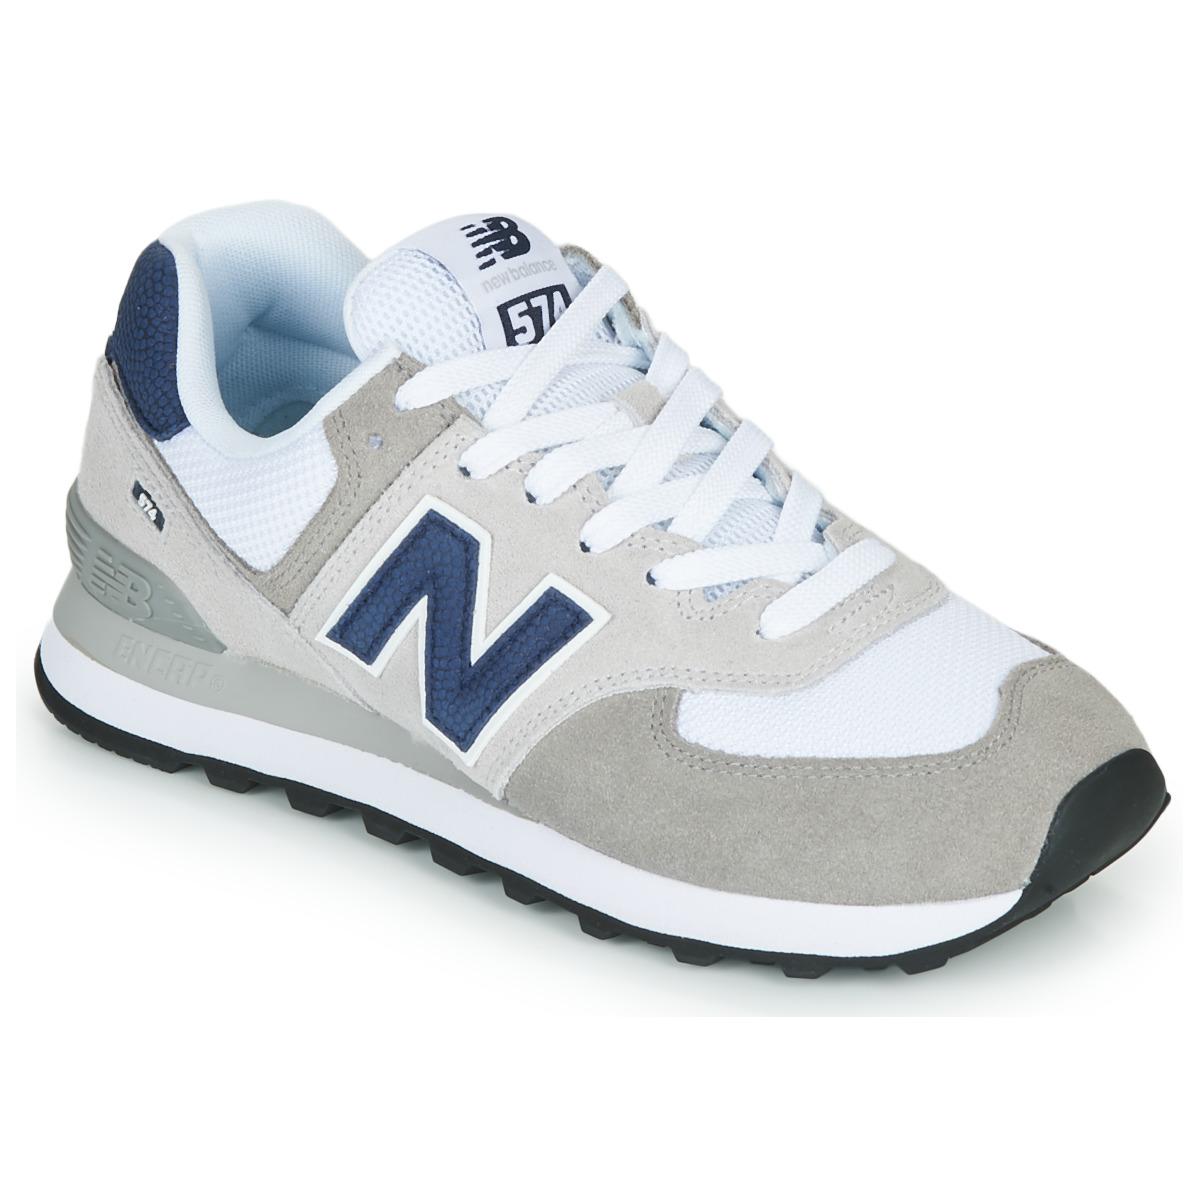 Sneakers basse donna New Balance 574 Grigio